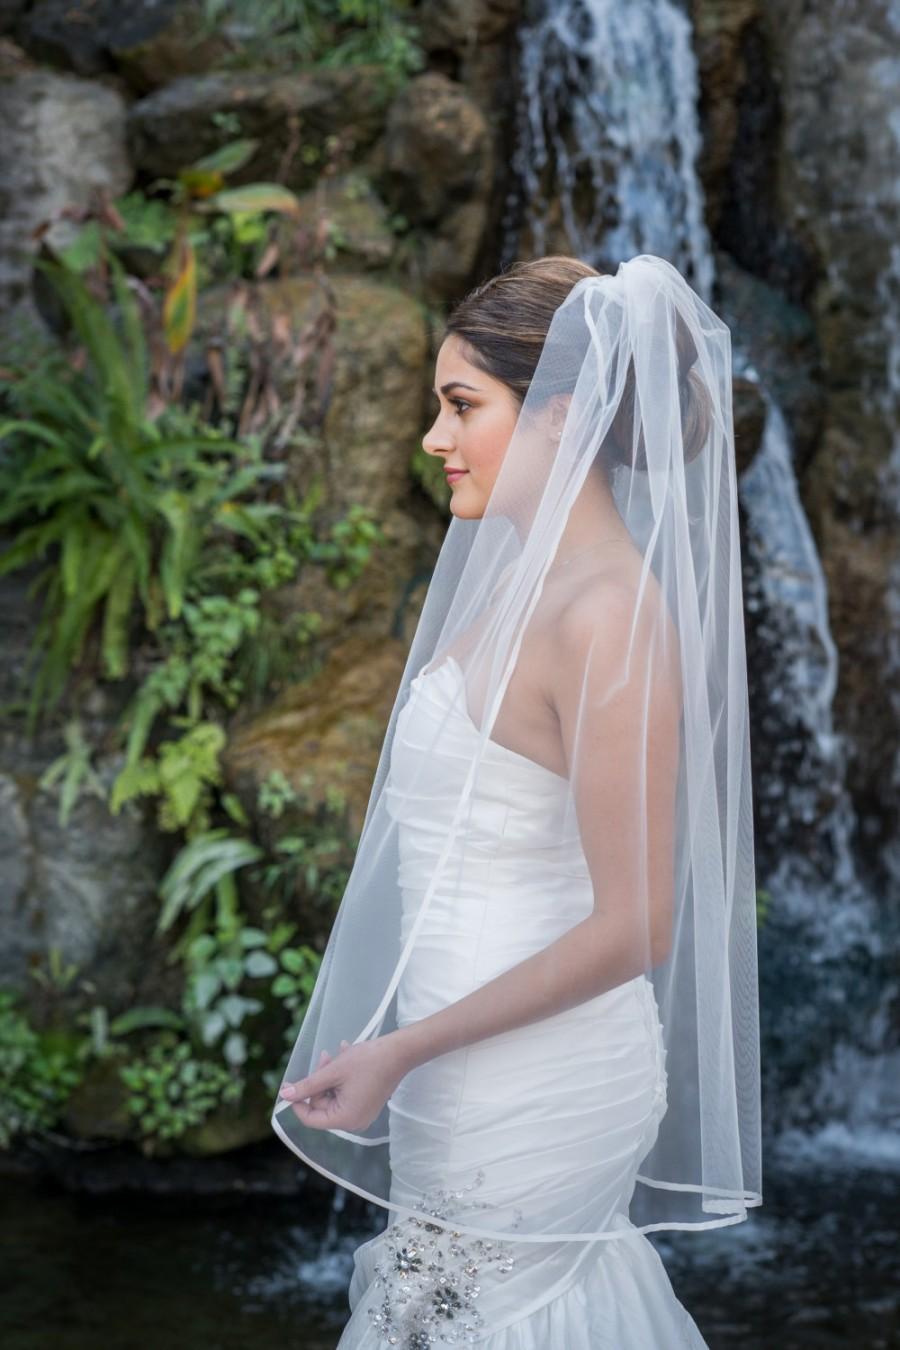 Hochzeit - Fingertip length veil with satin ribbon edge